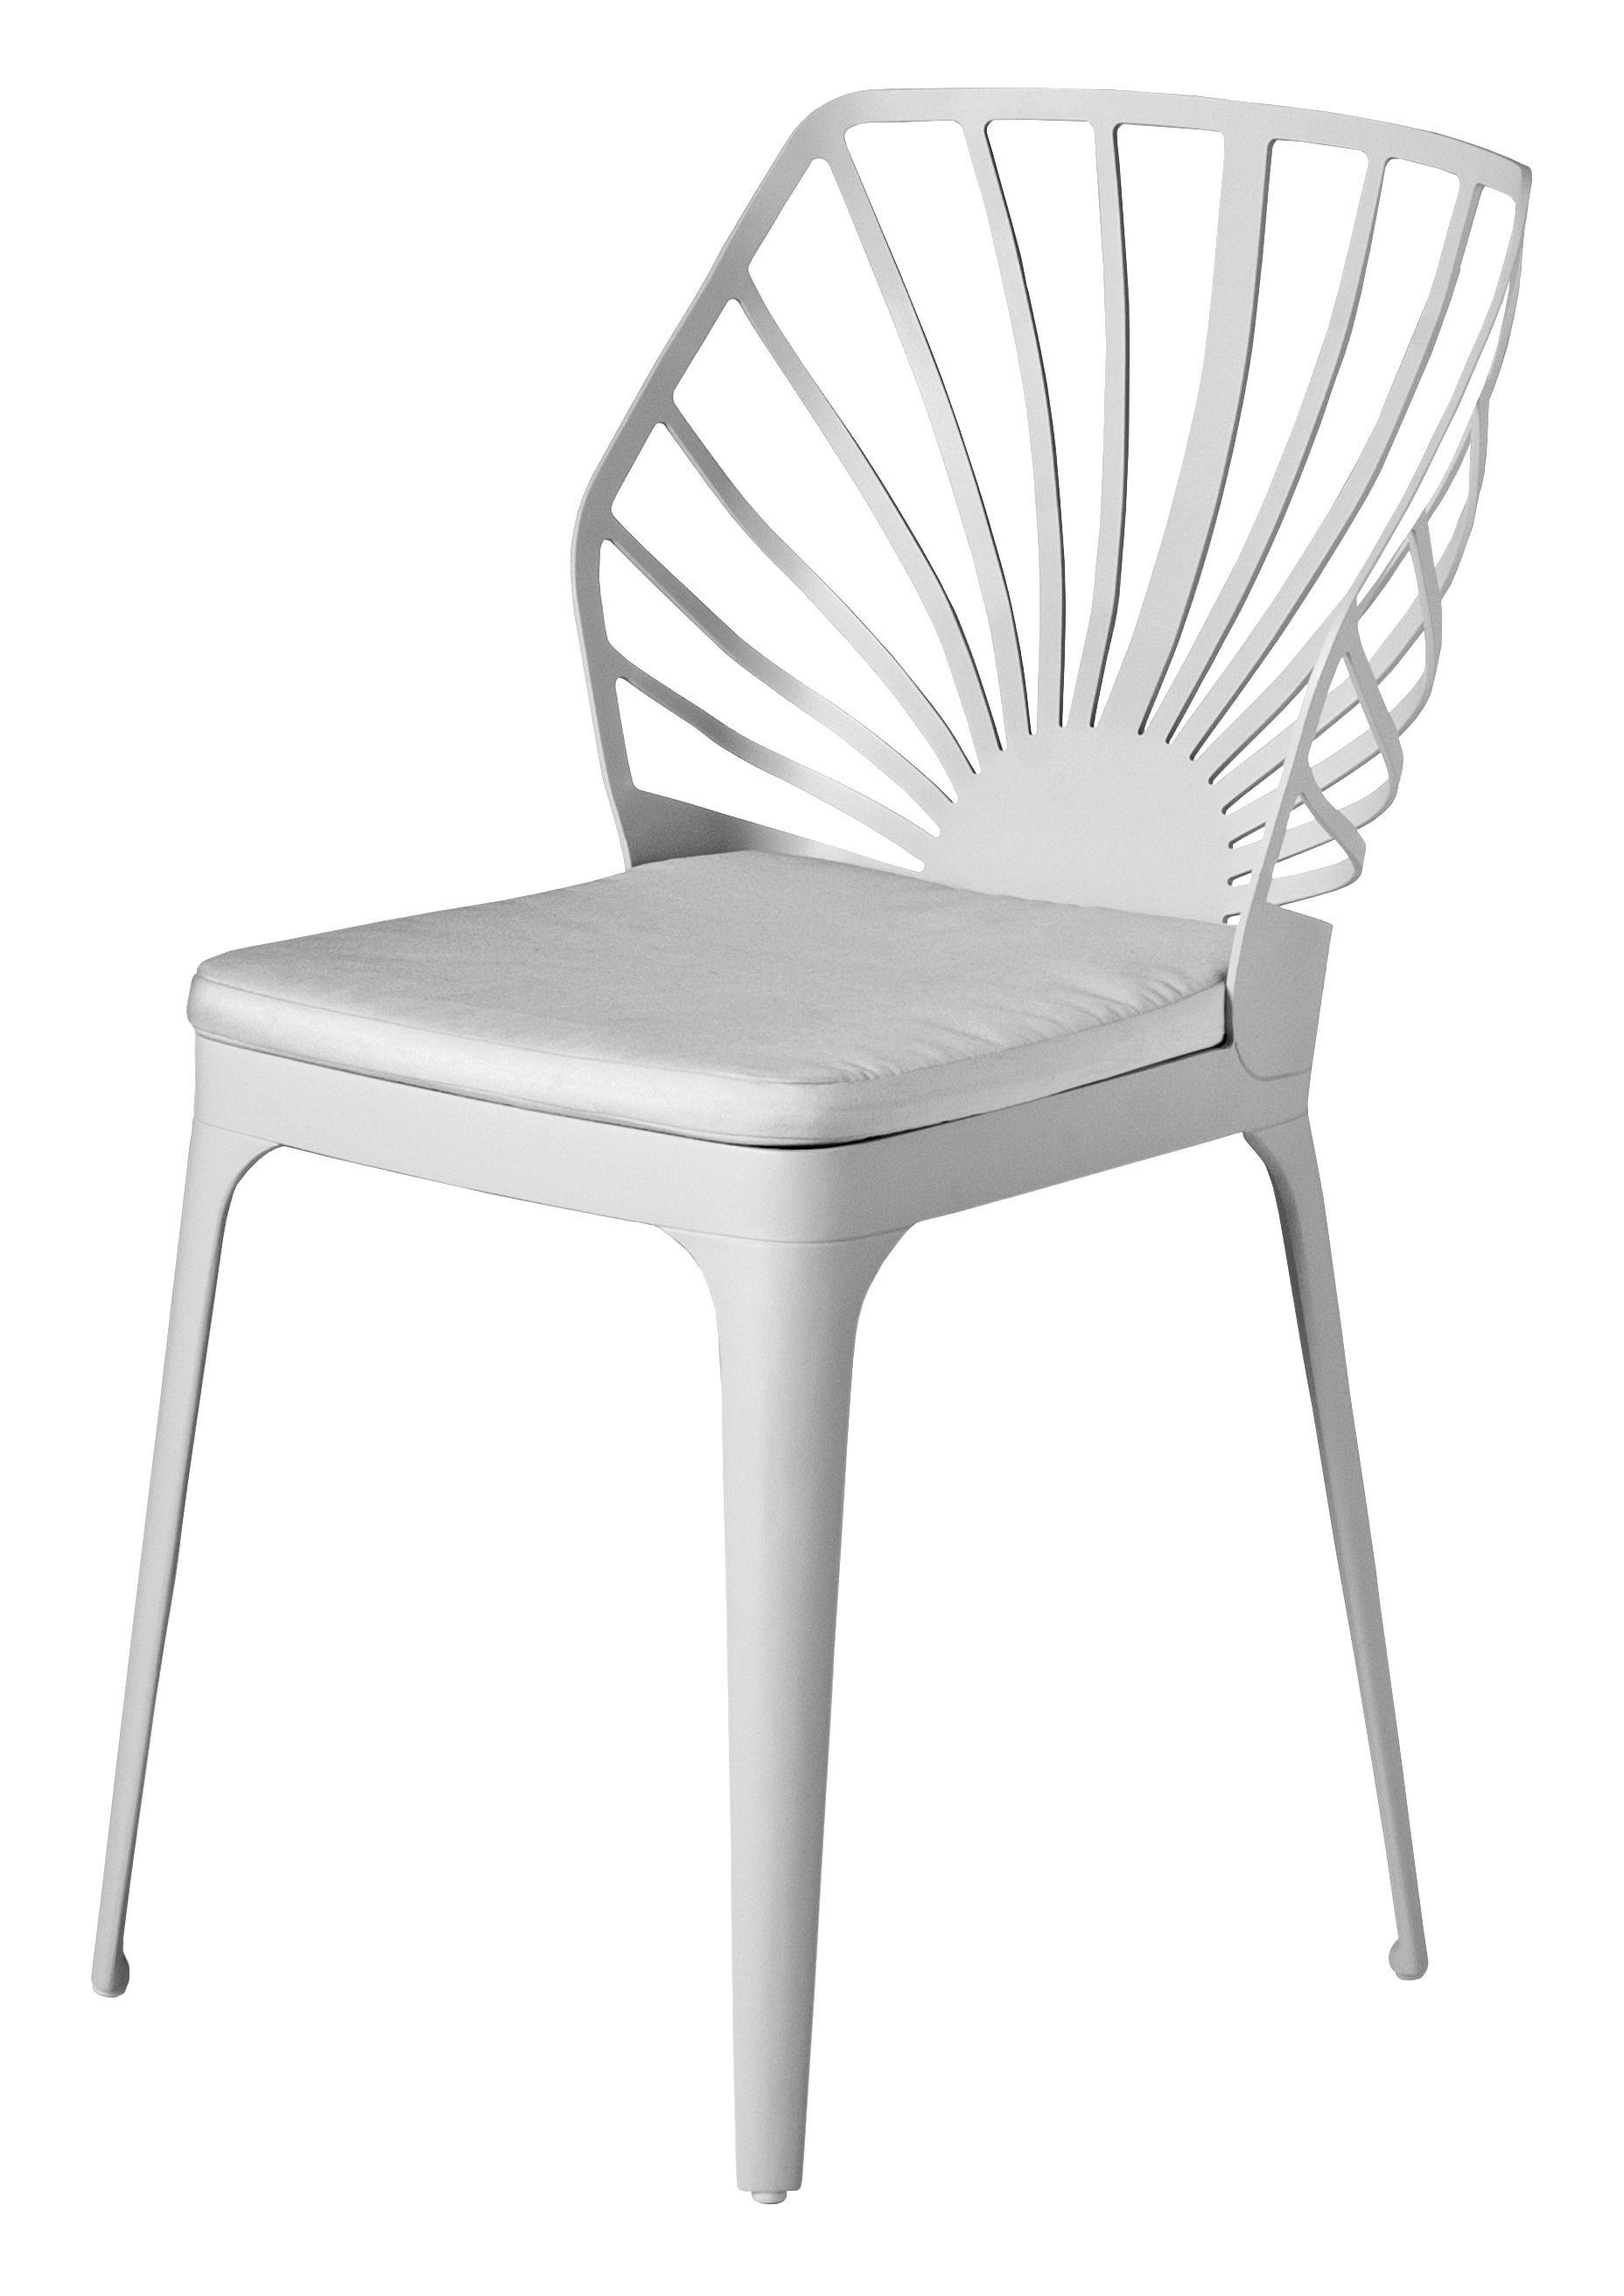 chaise sunrise m tal avec coussin blanc avec coussin driade. Black Bedroom Furniture Sets. Home Design Ideas